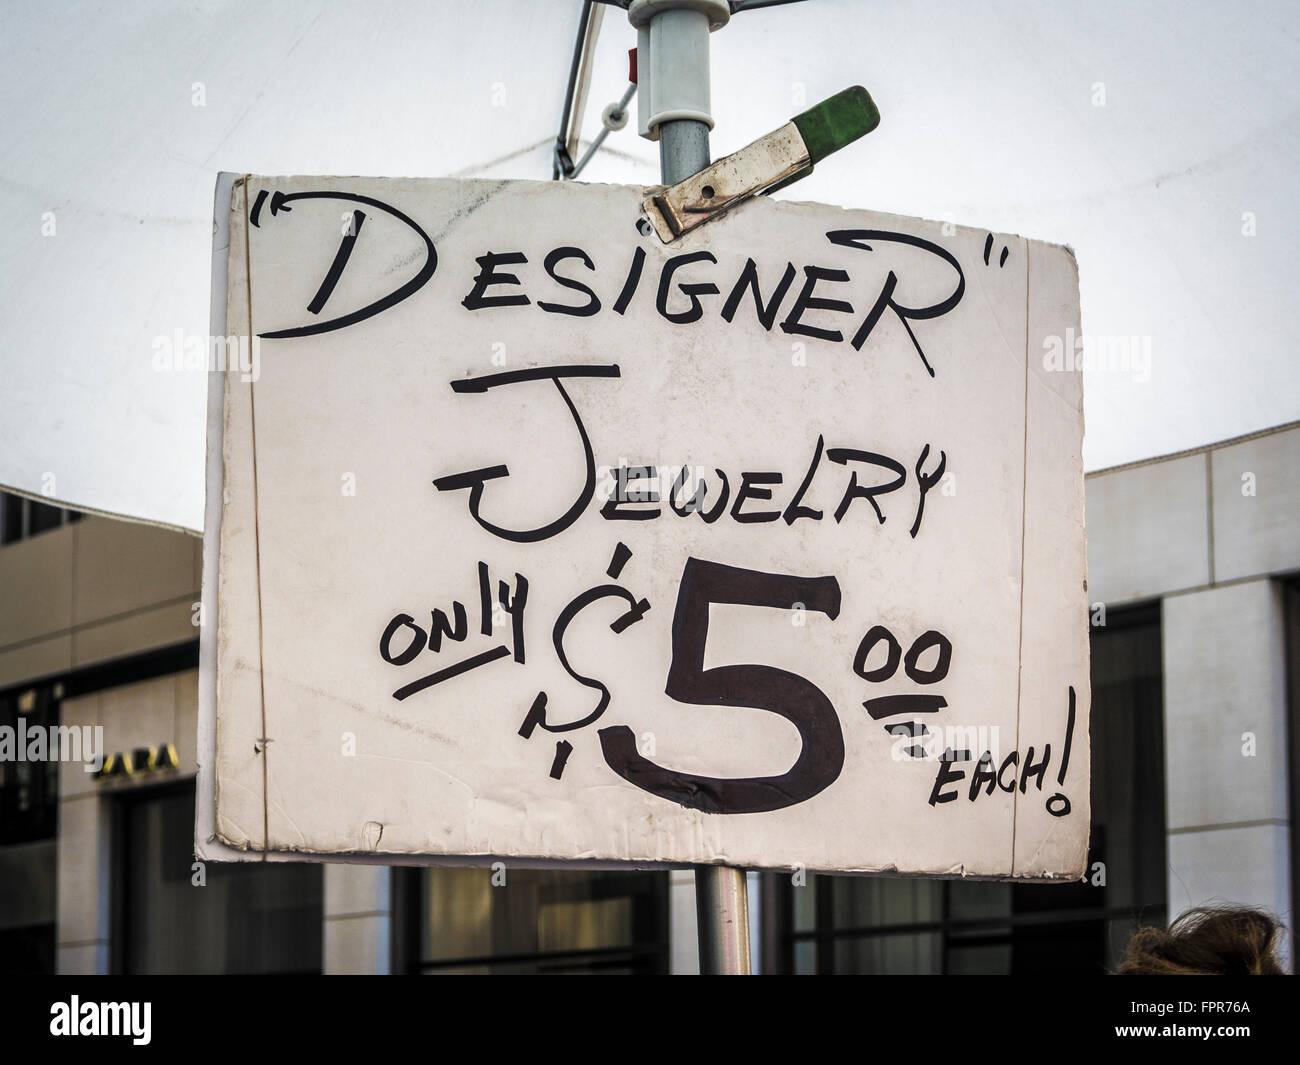 Cheap hand written Designer Jewelry sign, New York City, USA. - Stock Image